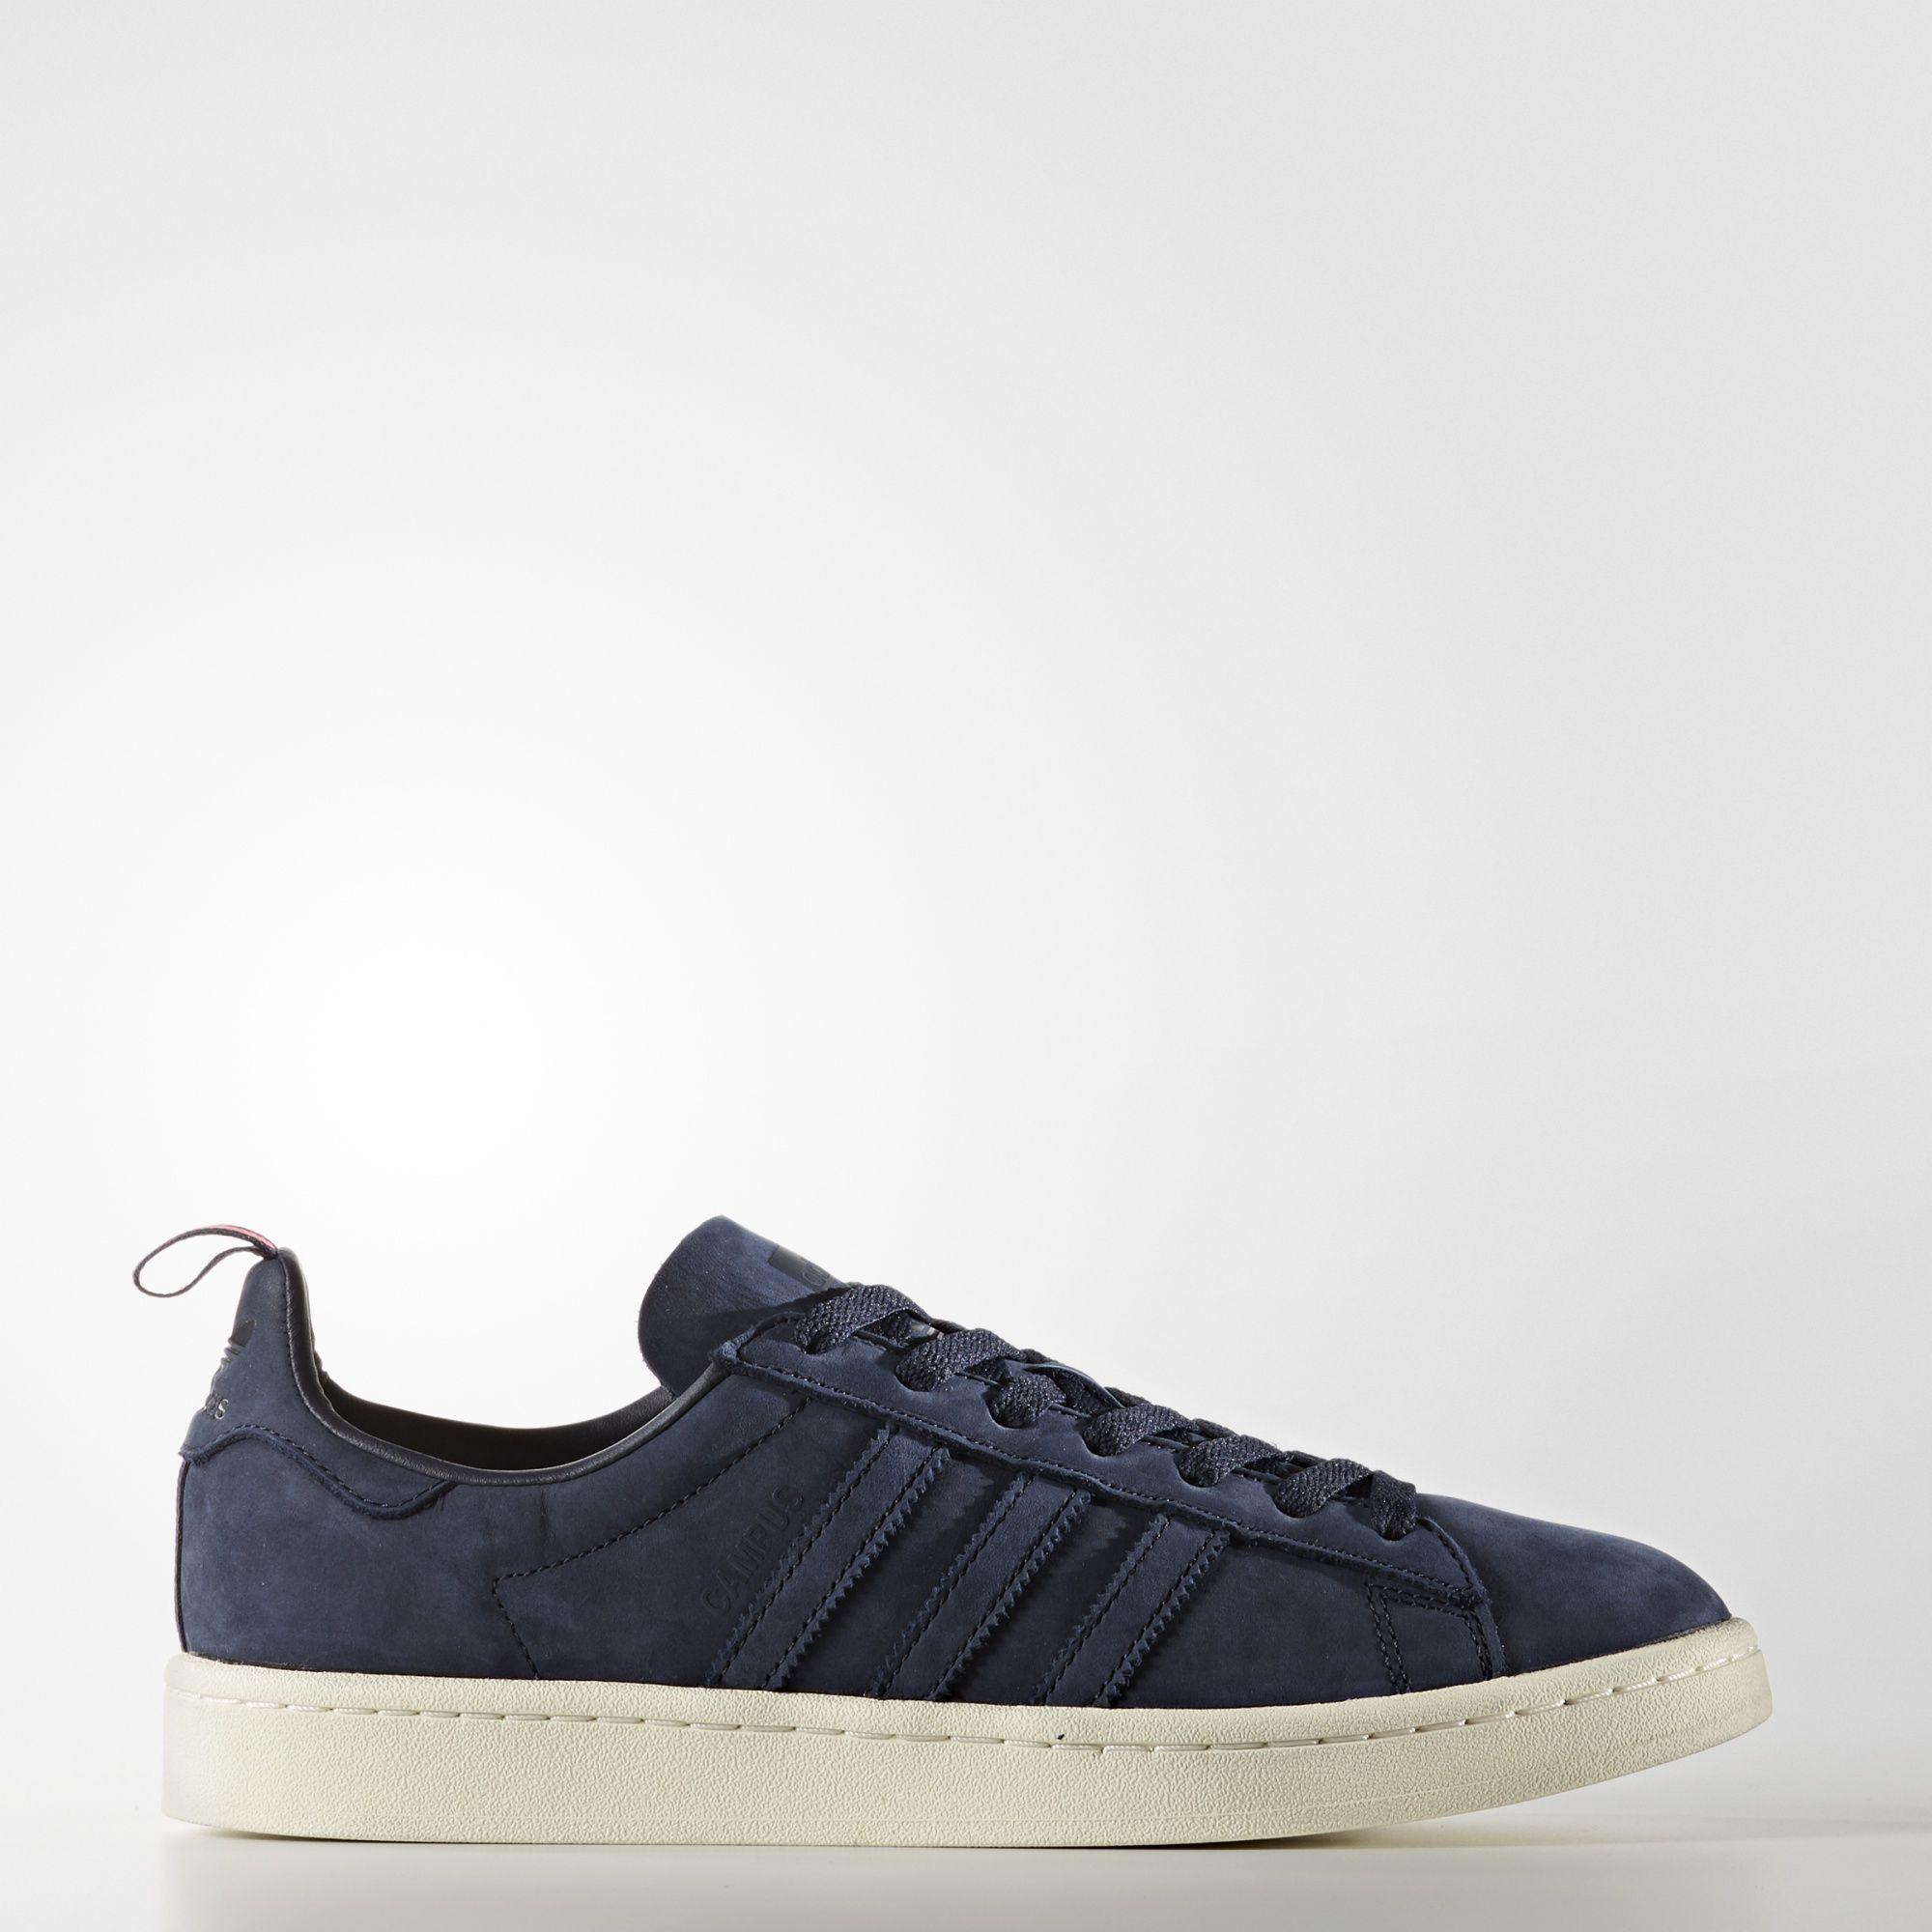 best service 8efbd f7eac adidas - Tênis Campus Blue Adidas, Adidas Men, Adidas Campus Shoes, Adidas  Shoes